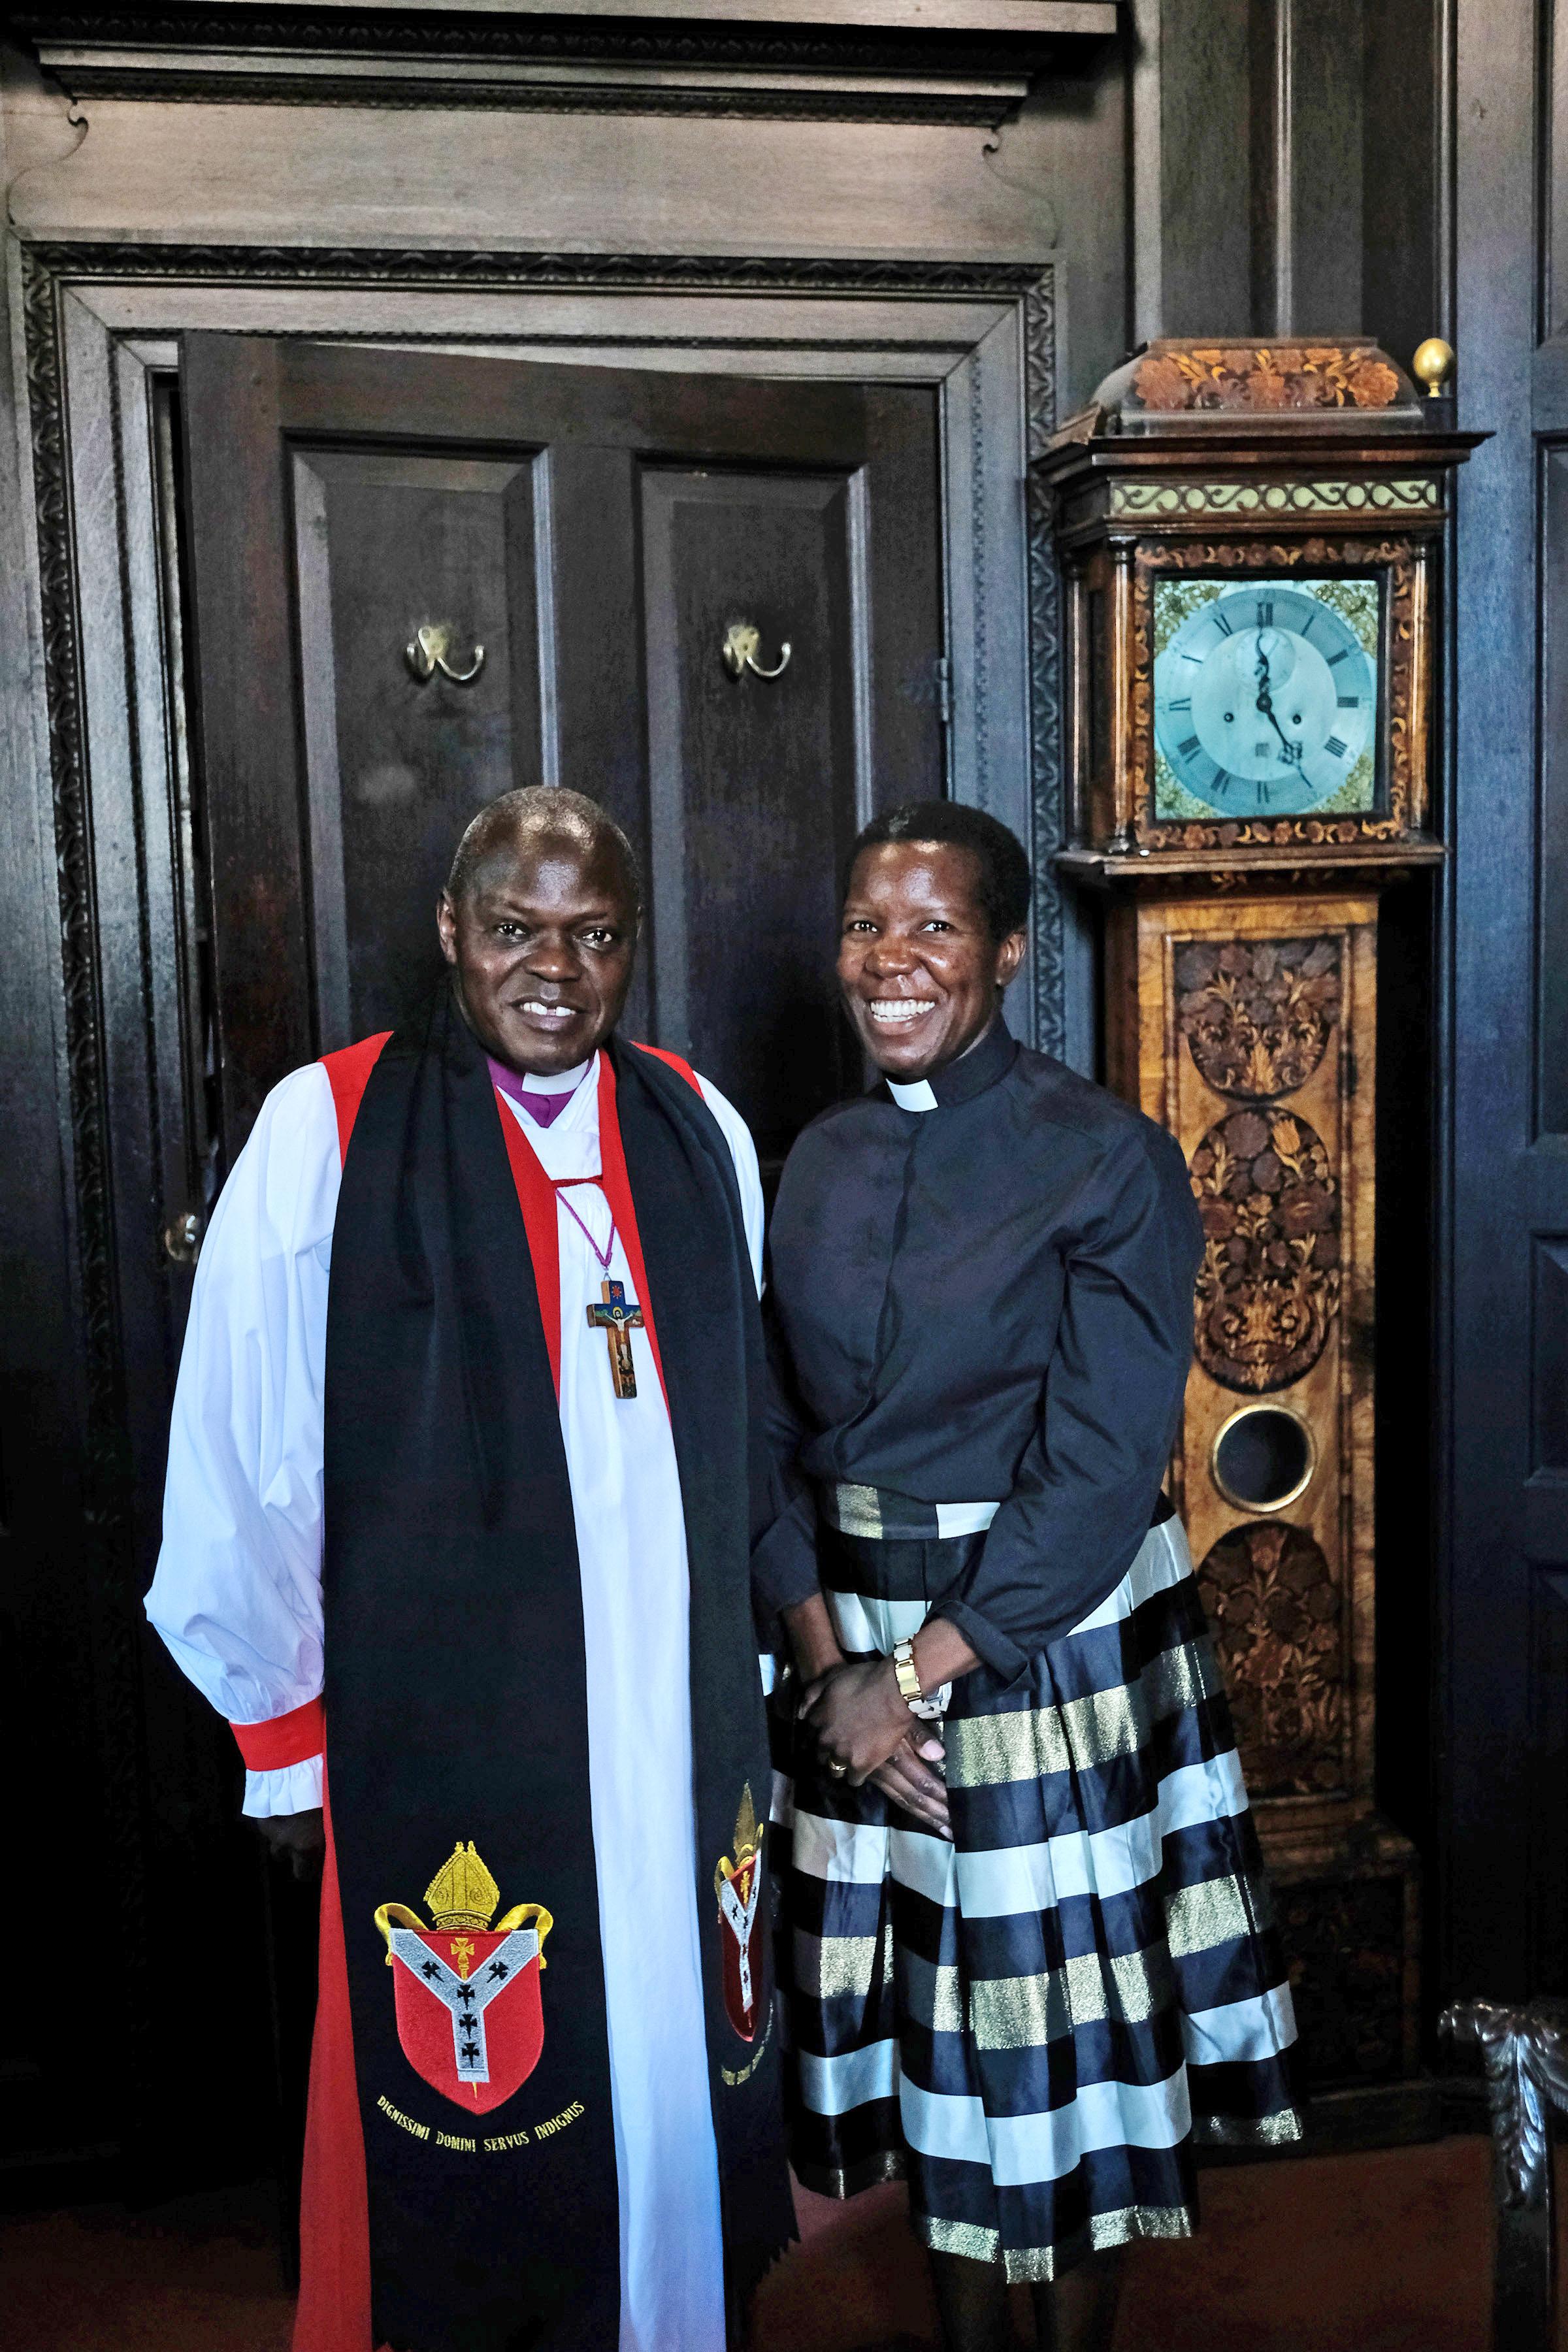 Archbishop of York, Rev Grace Sentamu-Baverstock